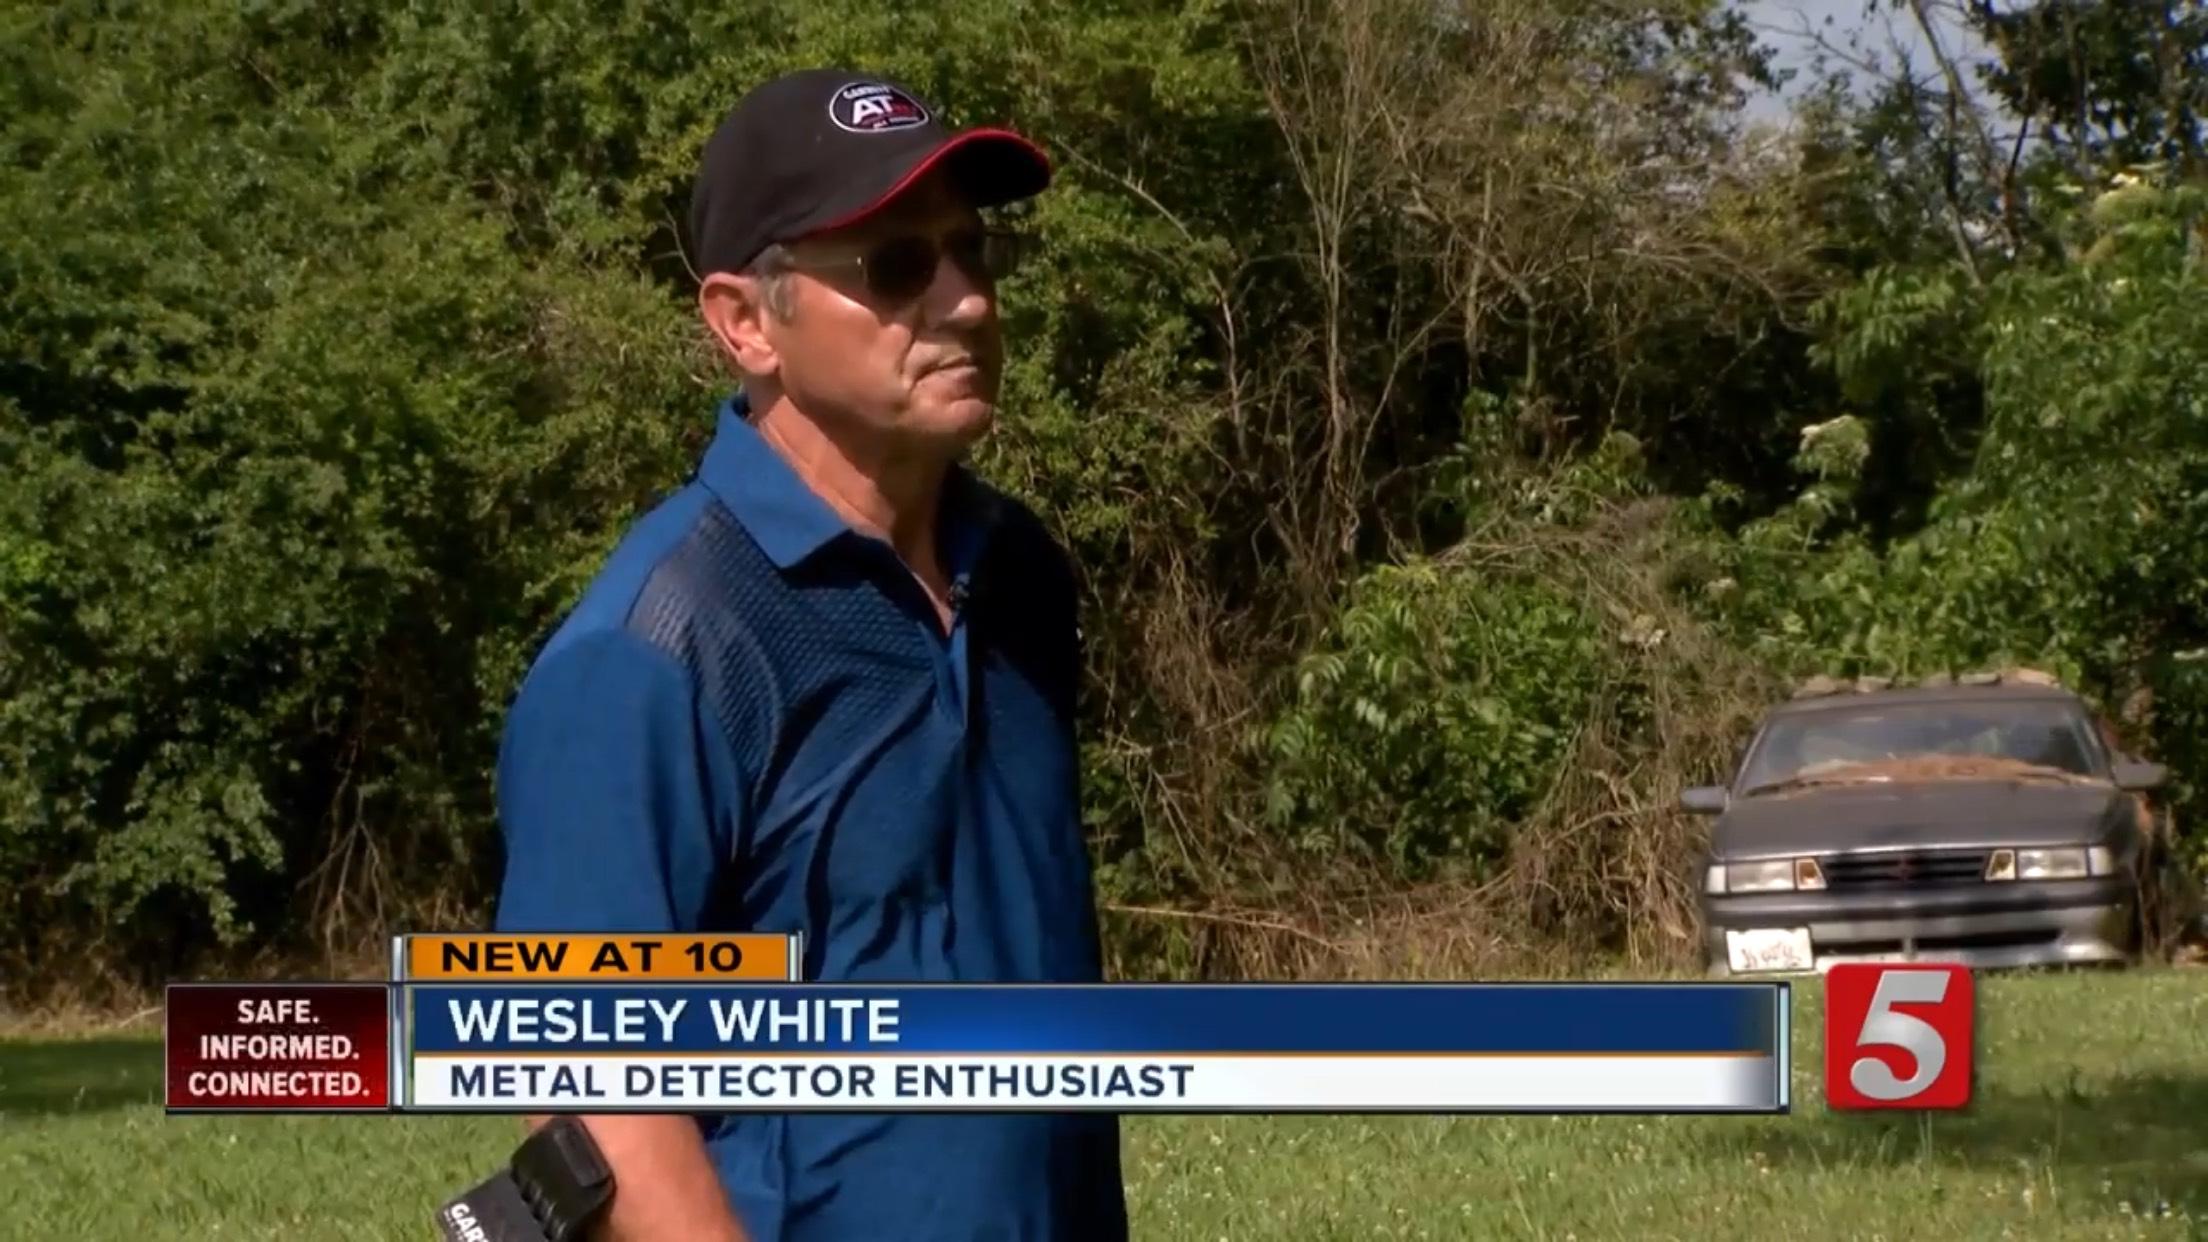 Wesley White: Metal Detector Enthusiast